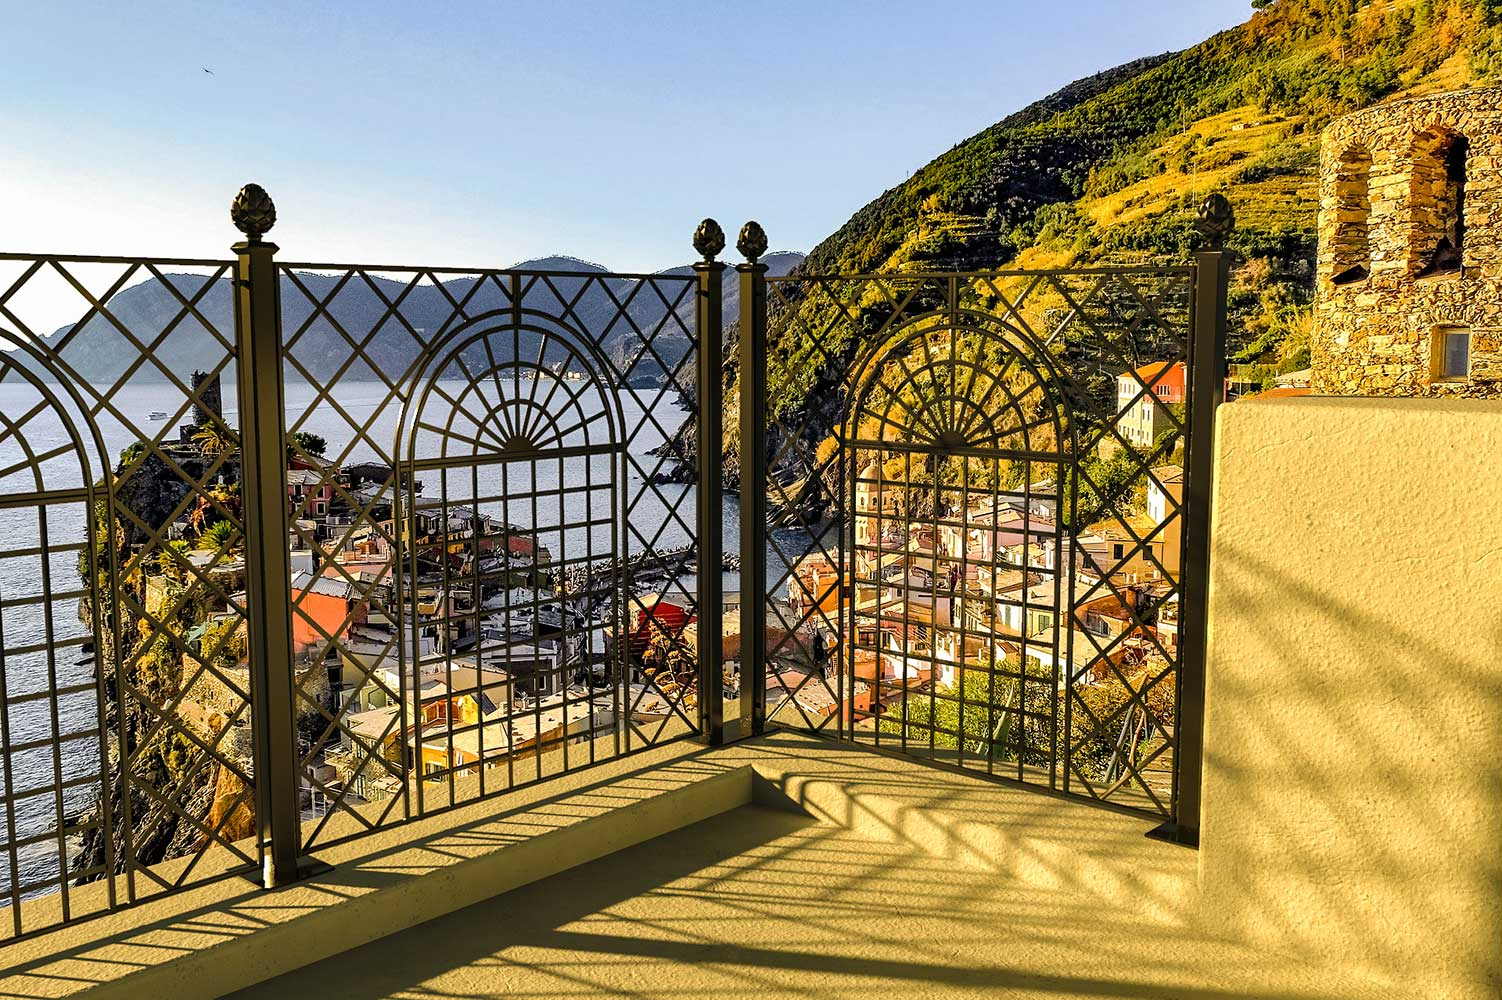 Kunstschmiede Zaun Orangerie Set (1)